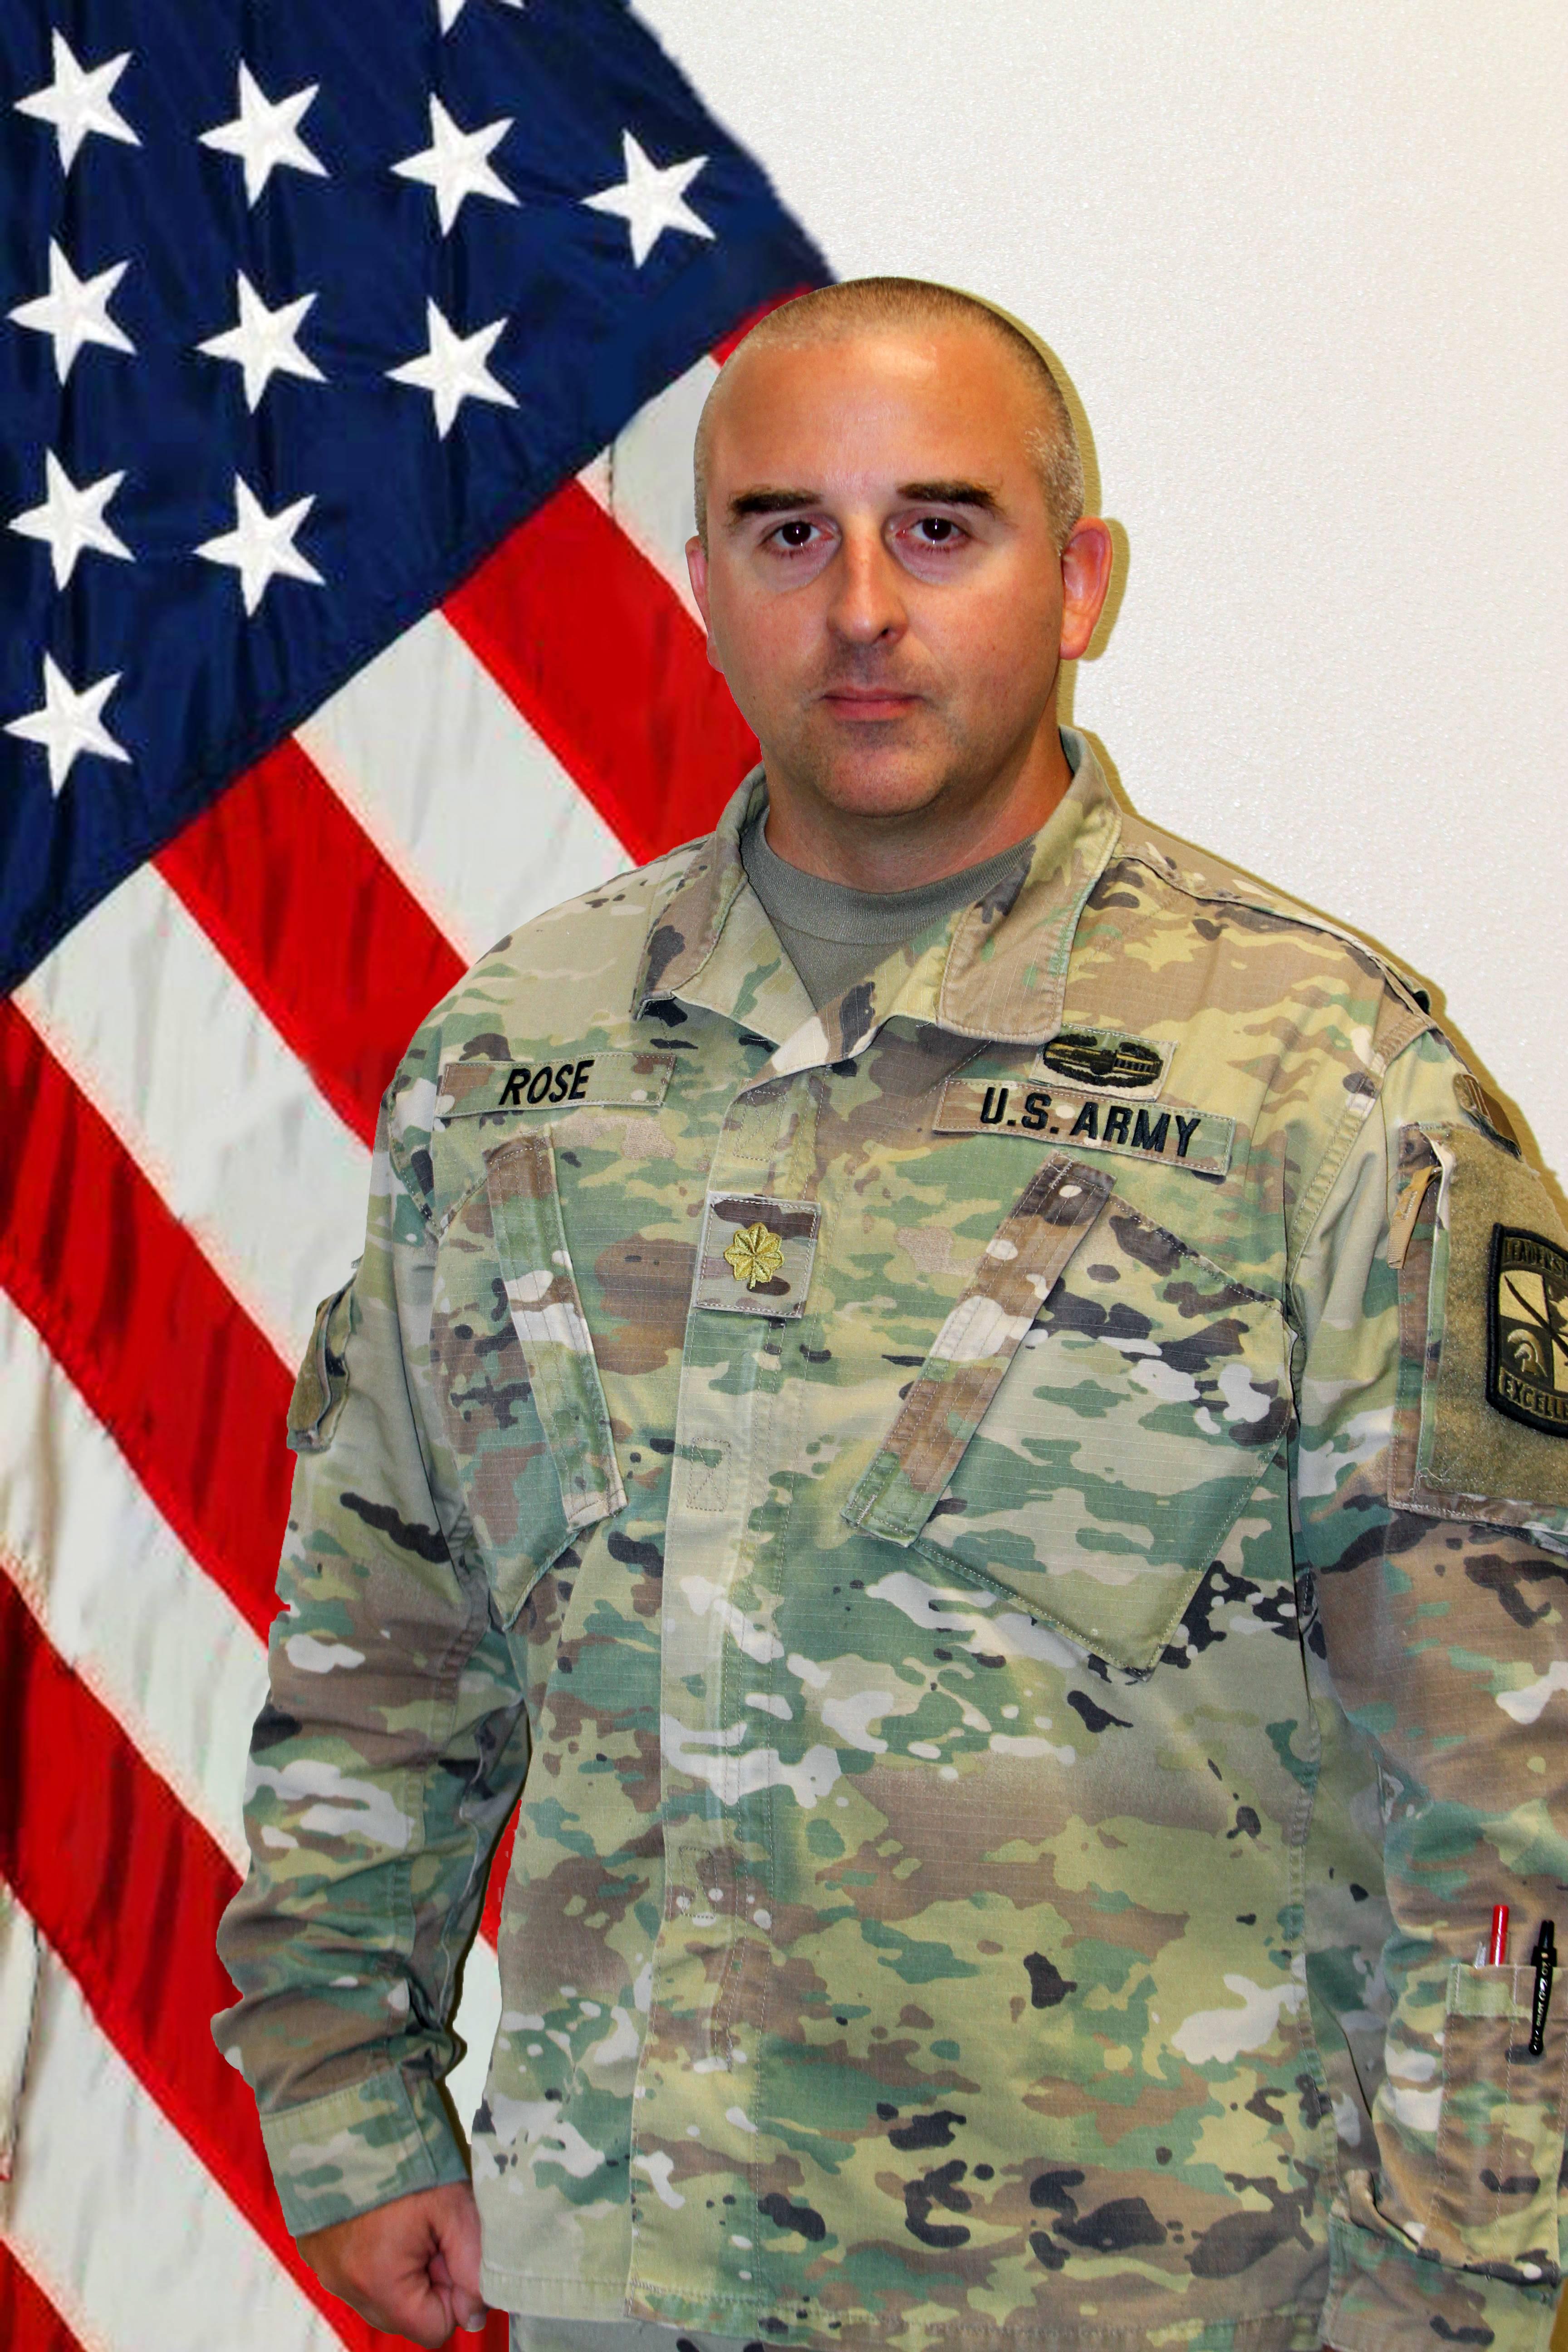 MAJ Kristopher Rose, S3/Assistant Professor of Military Science